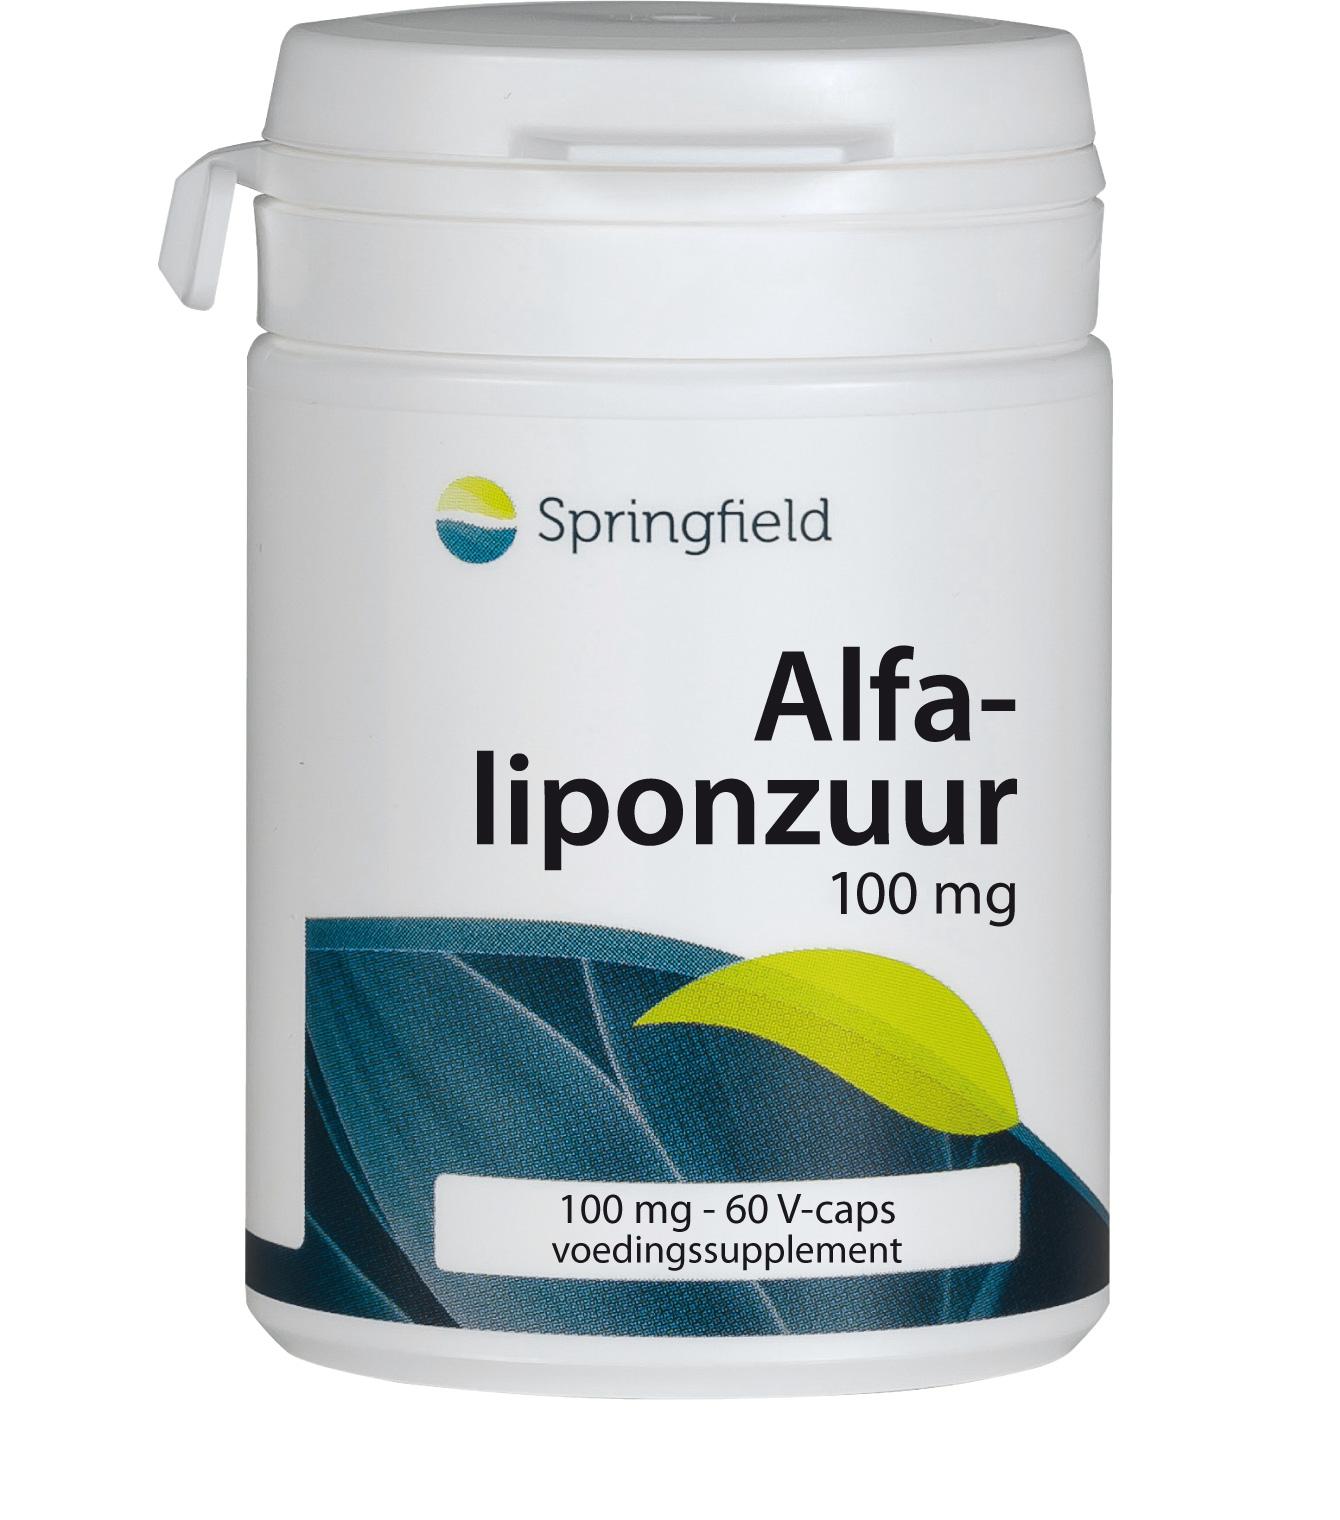 Alfa-liponzuur (ALA) 100 mg 60 V-capsules